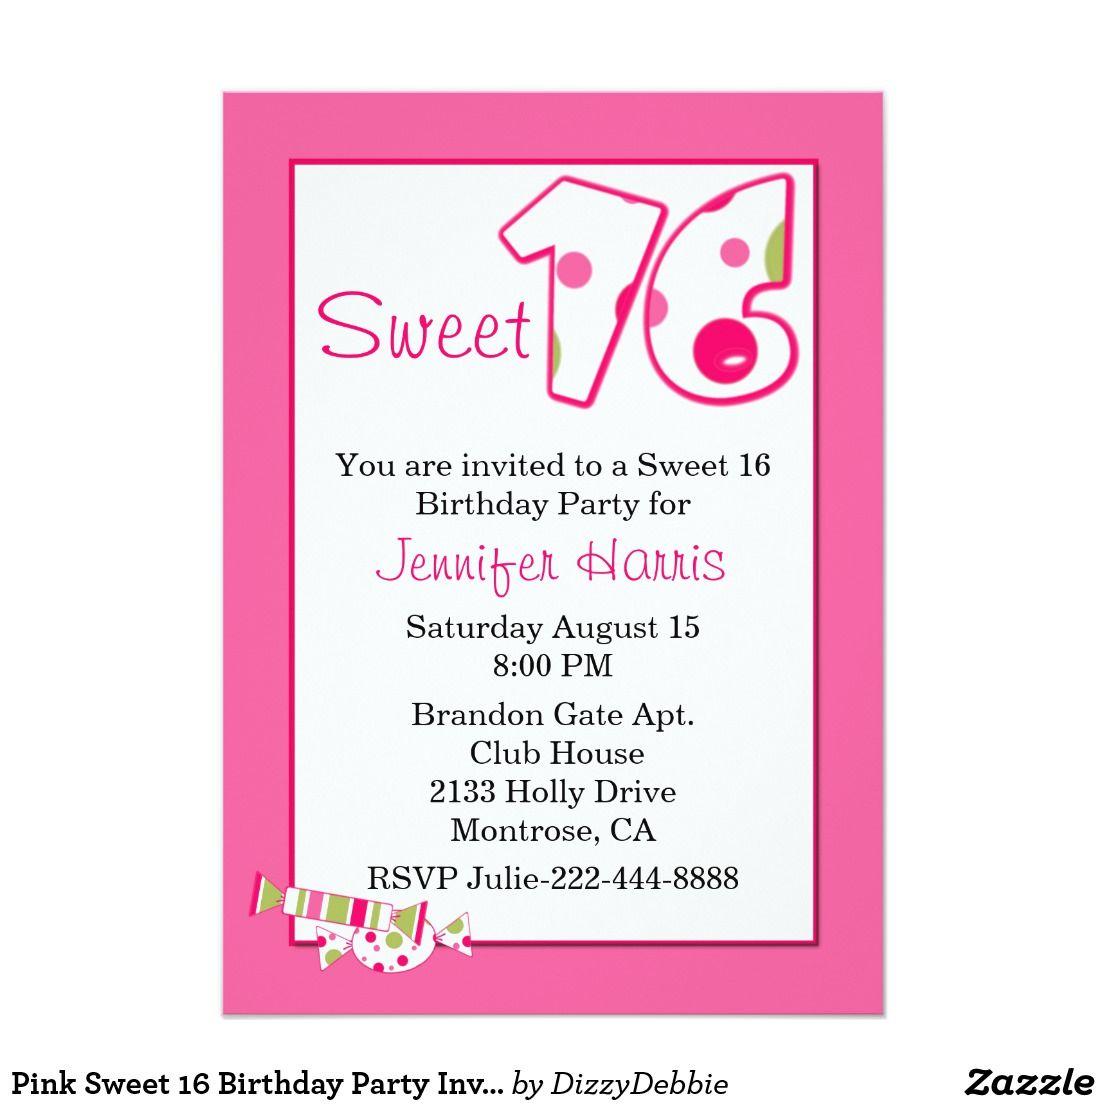 Pink Sweet 16 Birthday Party Invitation | Pink sweet 16, Sixteenth ...